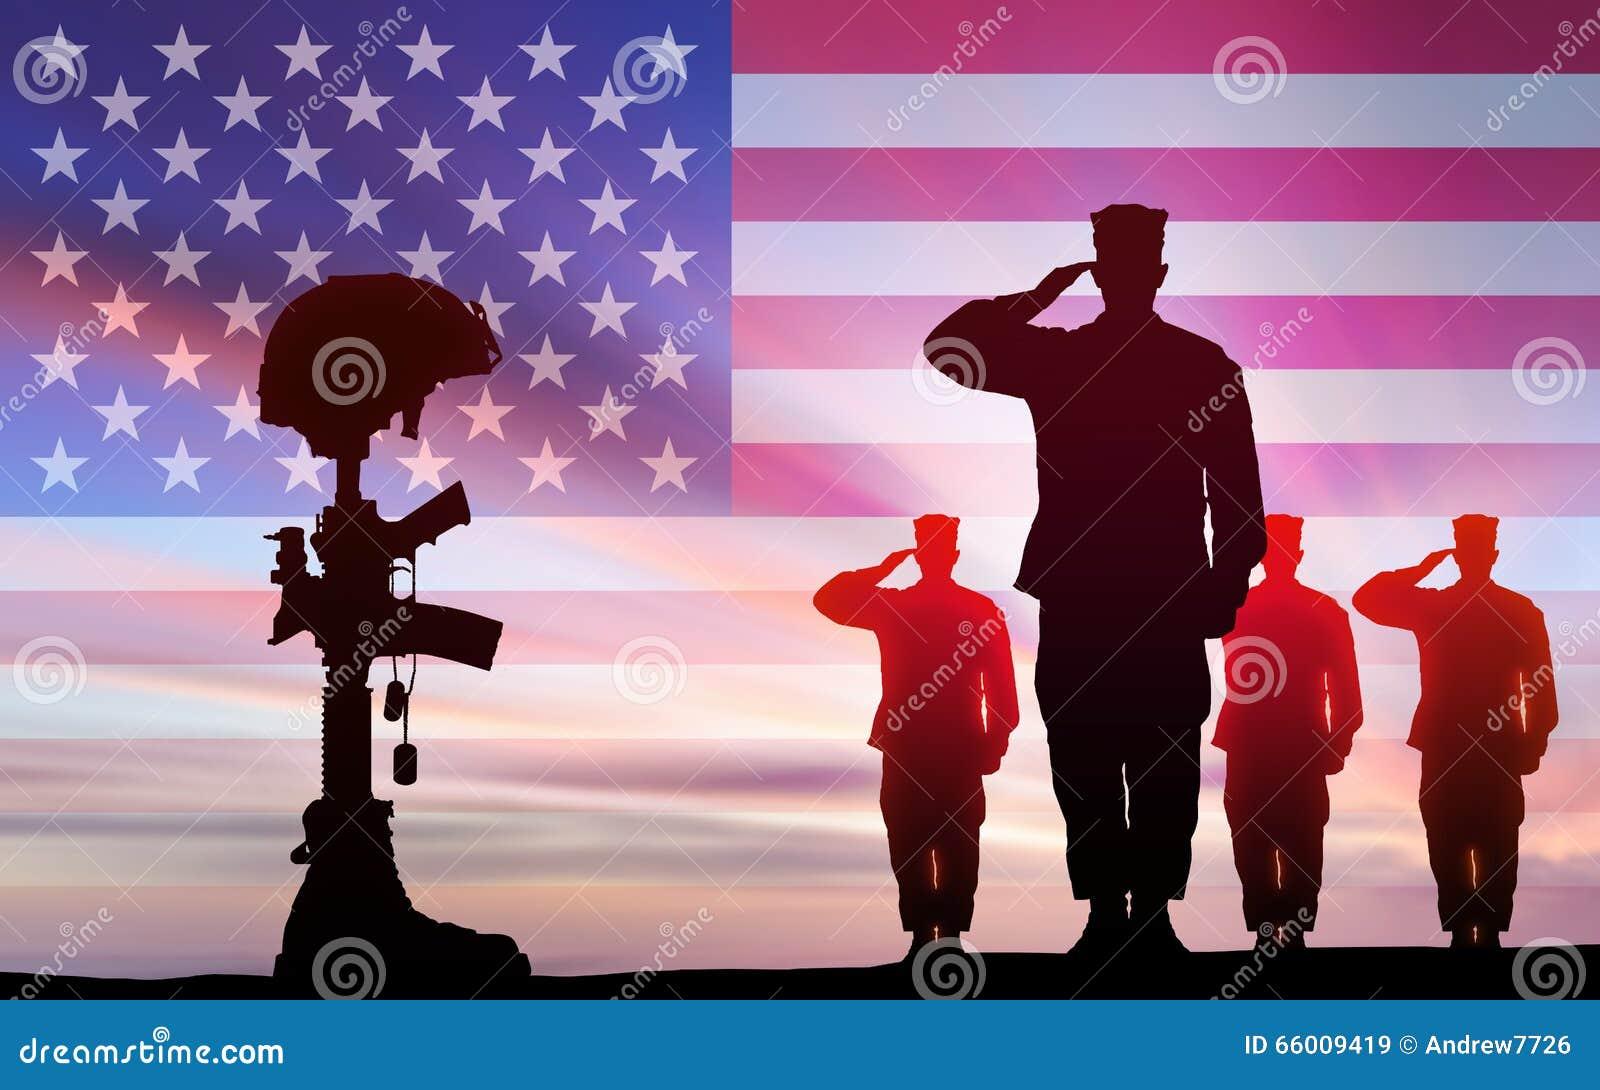 Soldiers Salute Fallen Comrade In Battle Stock